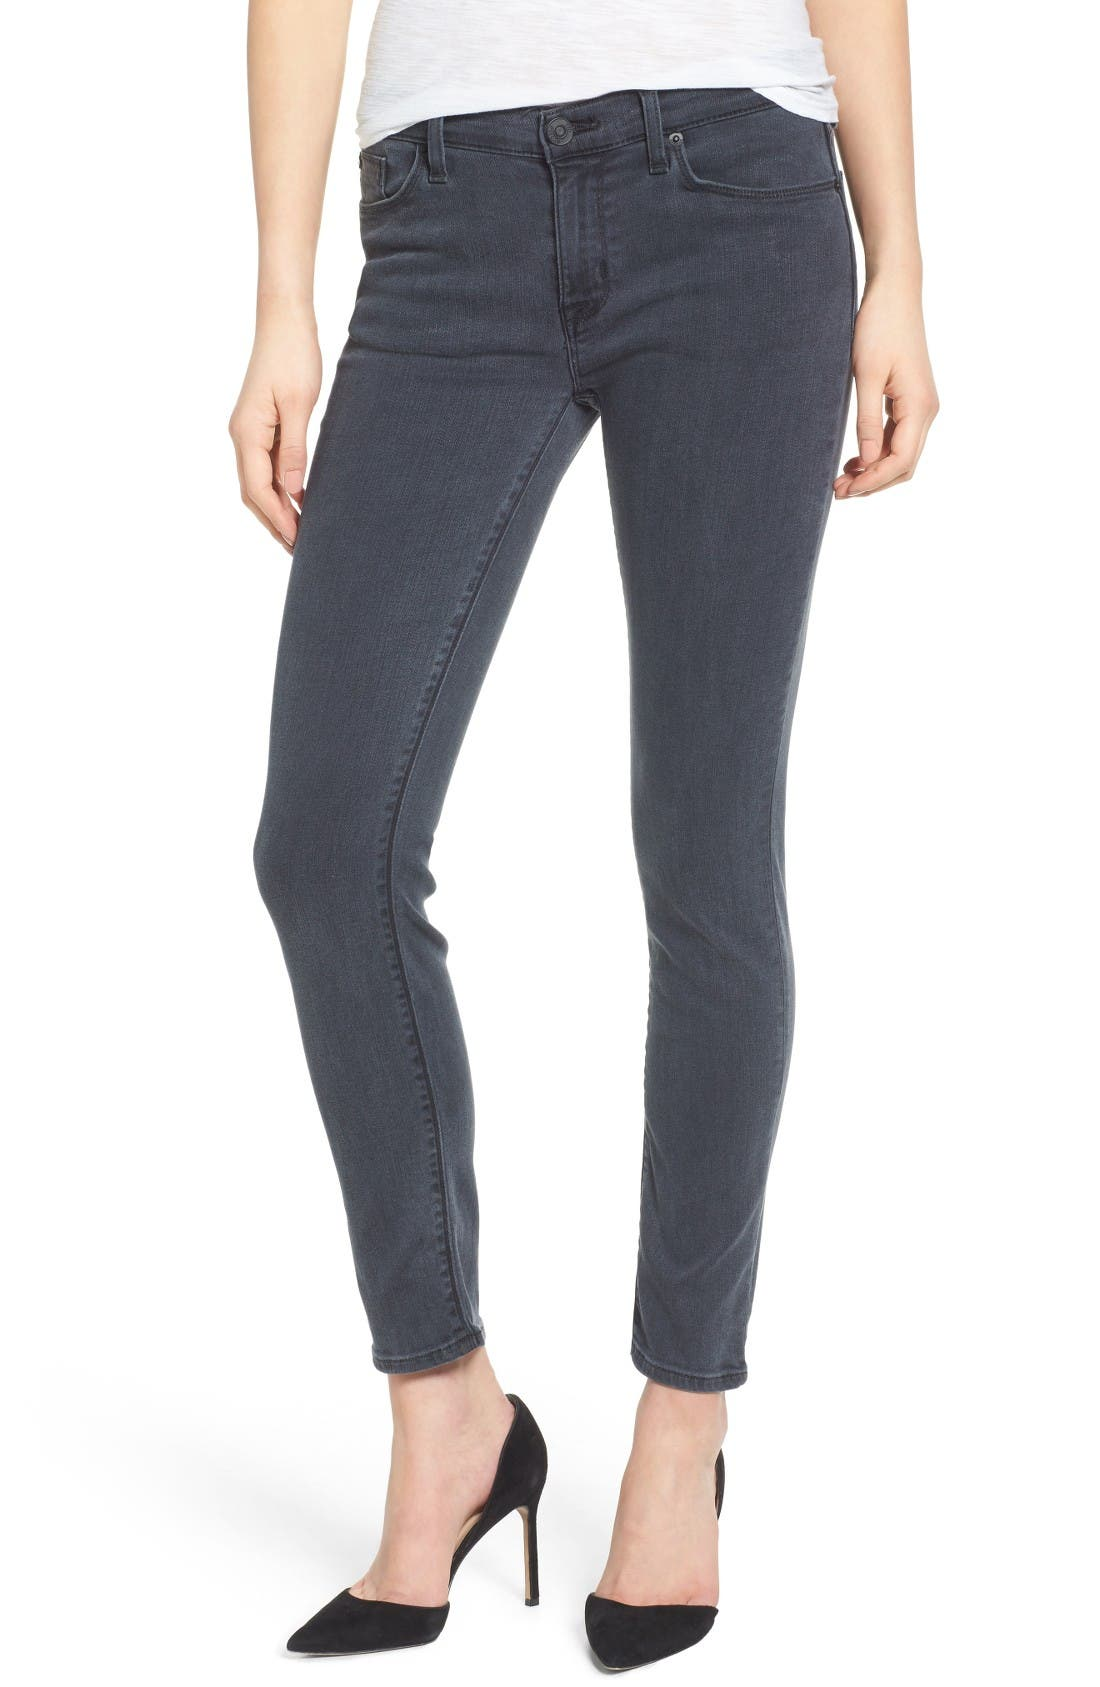 Main Image - Hudson Jeans Collette Ankle Skinny Jeans (Penumbra)